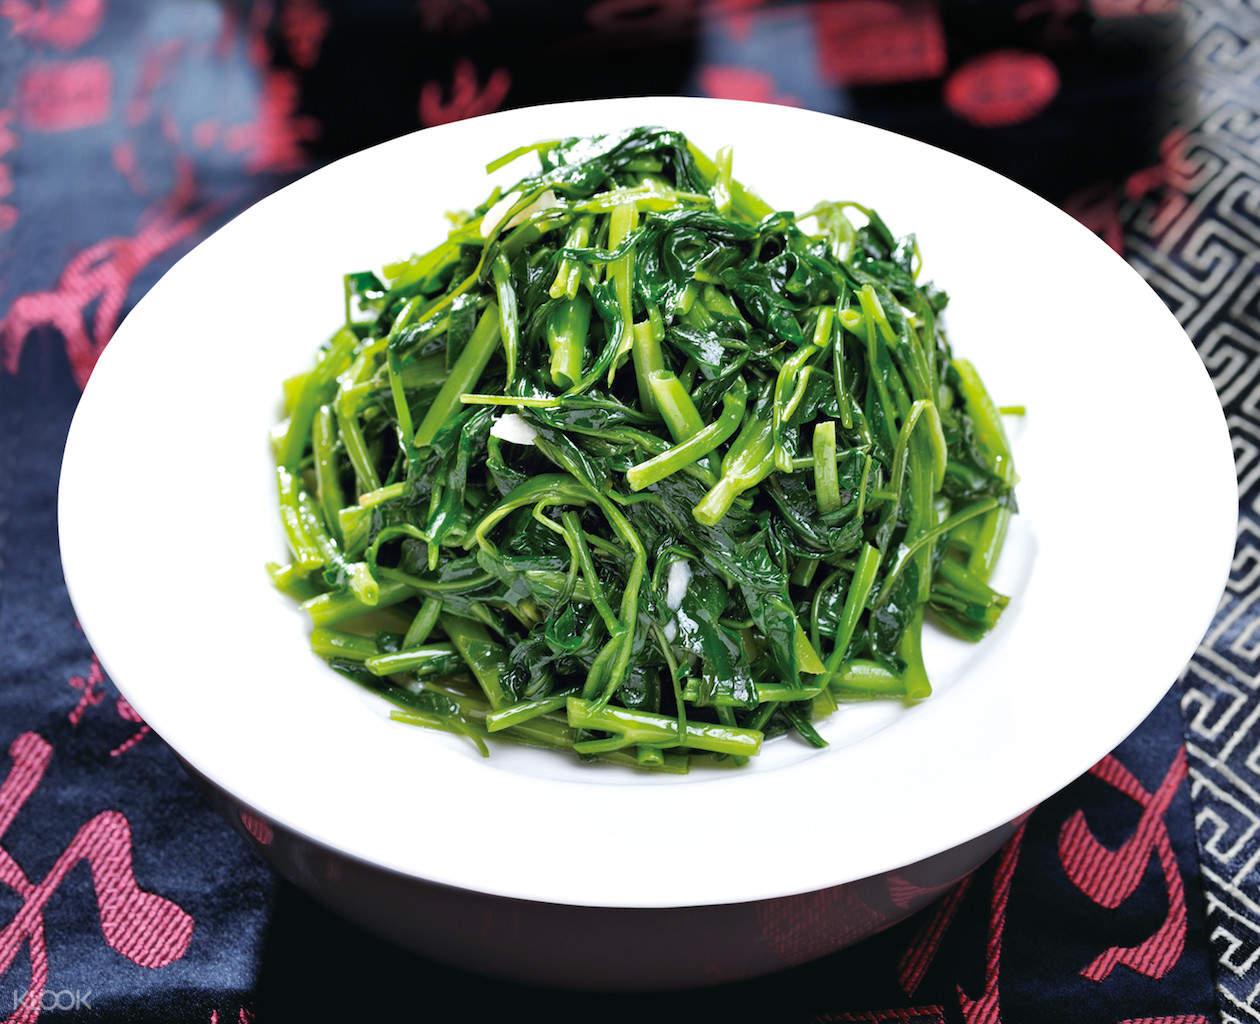 Stir-fried Vegetables at Din Tai Fung at Taipei 101